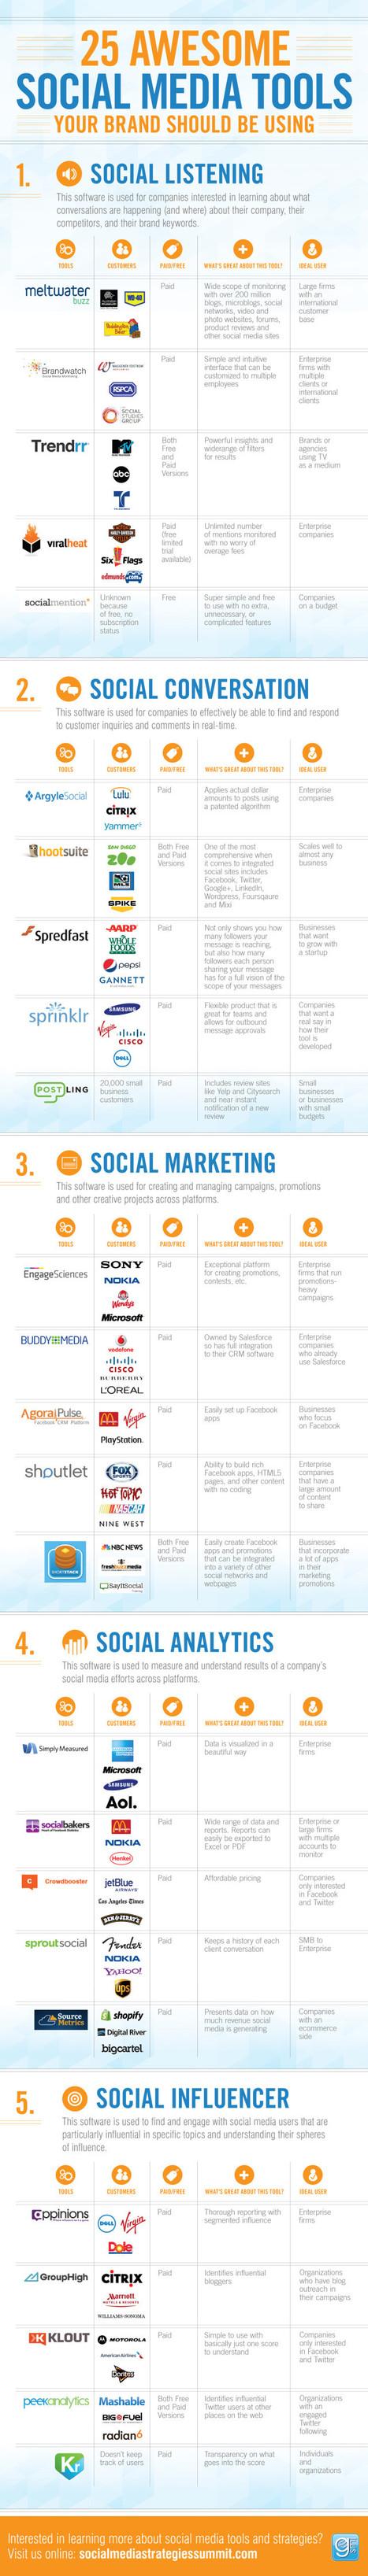 Infographic: 25 Awesome Social Media Tools - Marketing Technology Blog | #TheMarketingAutomationAlert | Digital Marketing | Scoop.it